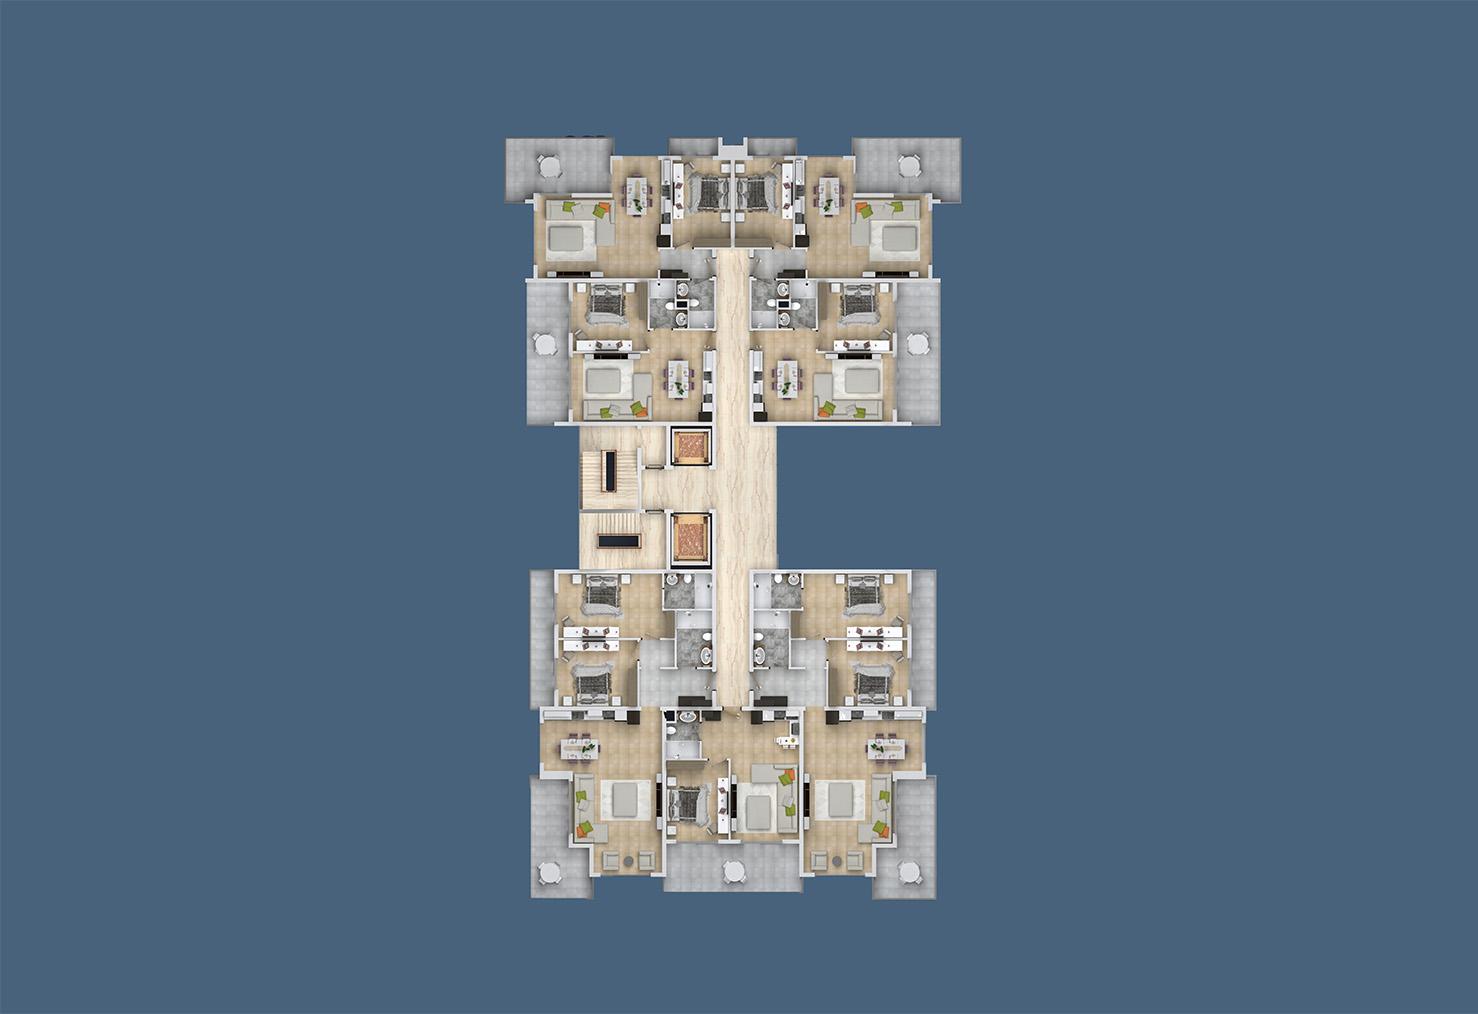 Floor plans of apartments 9 floor «B» Yekta Kingdom Trade Center